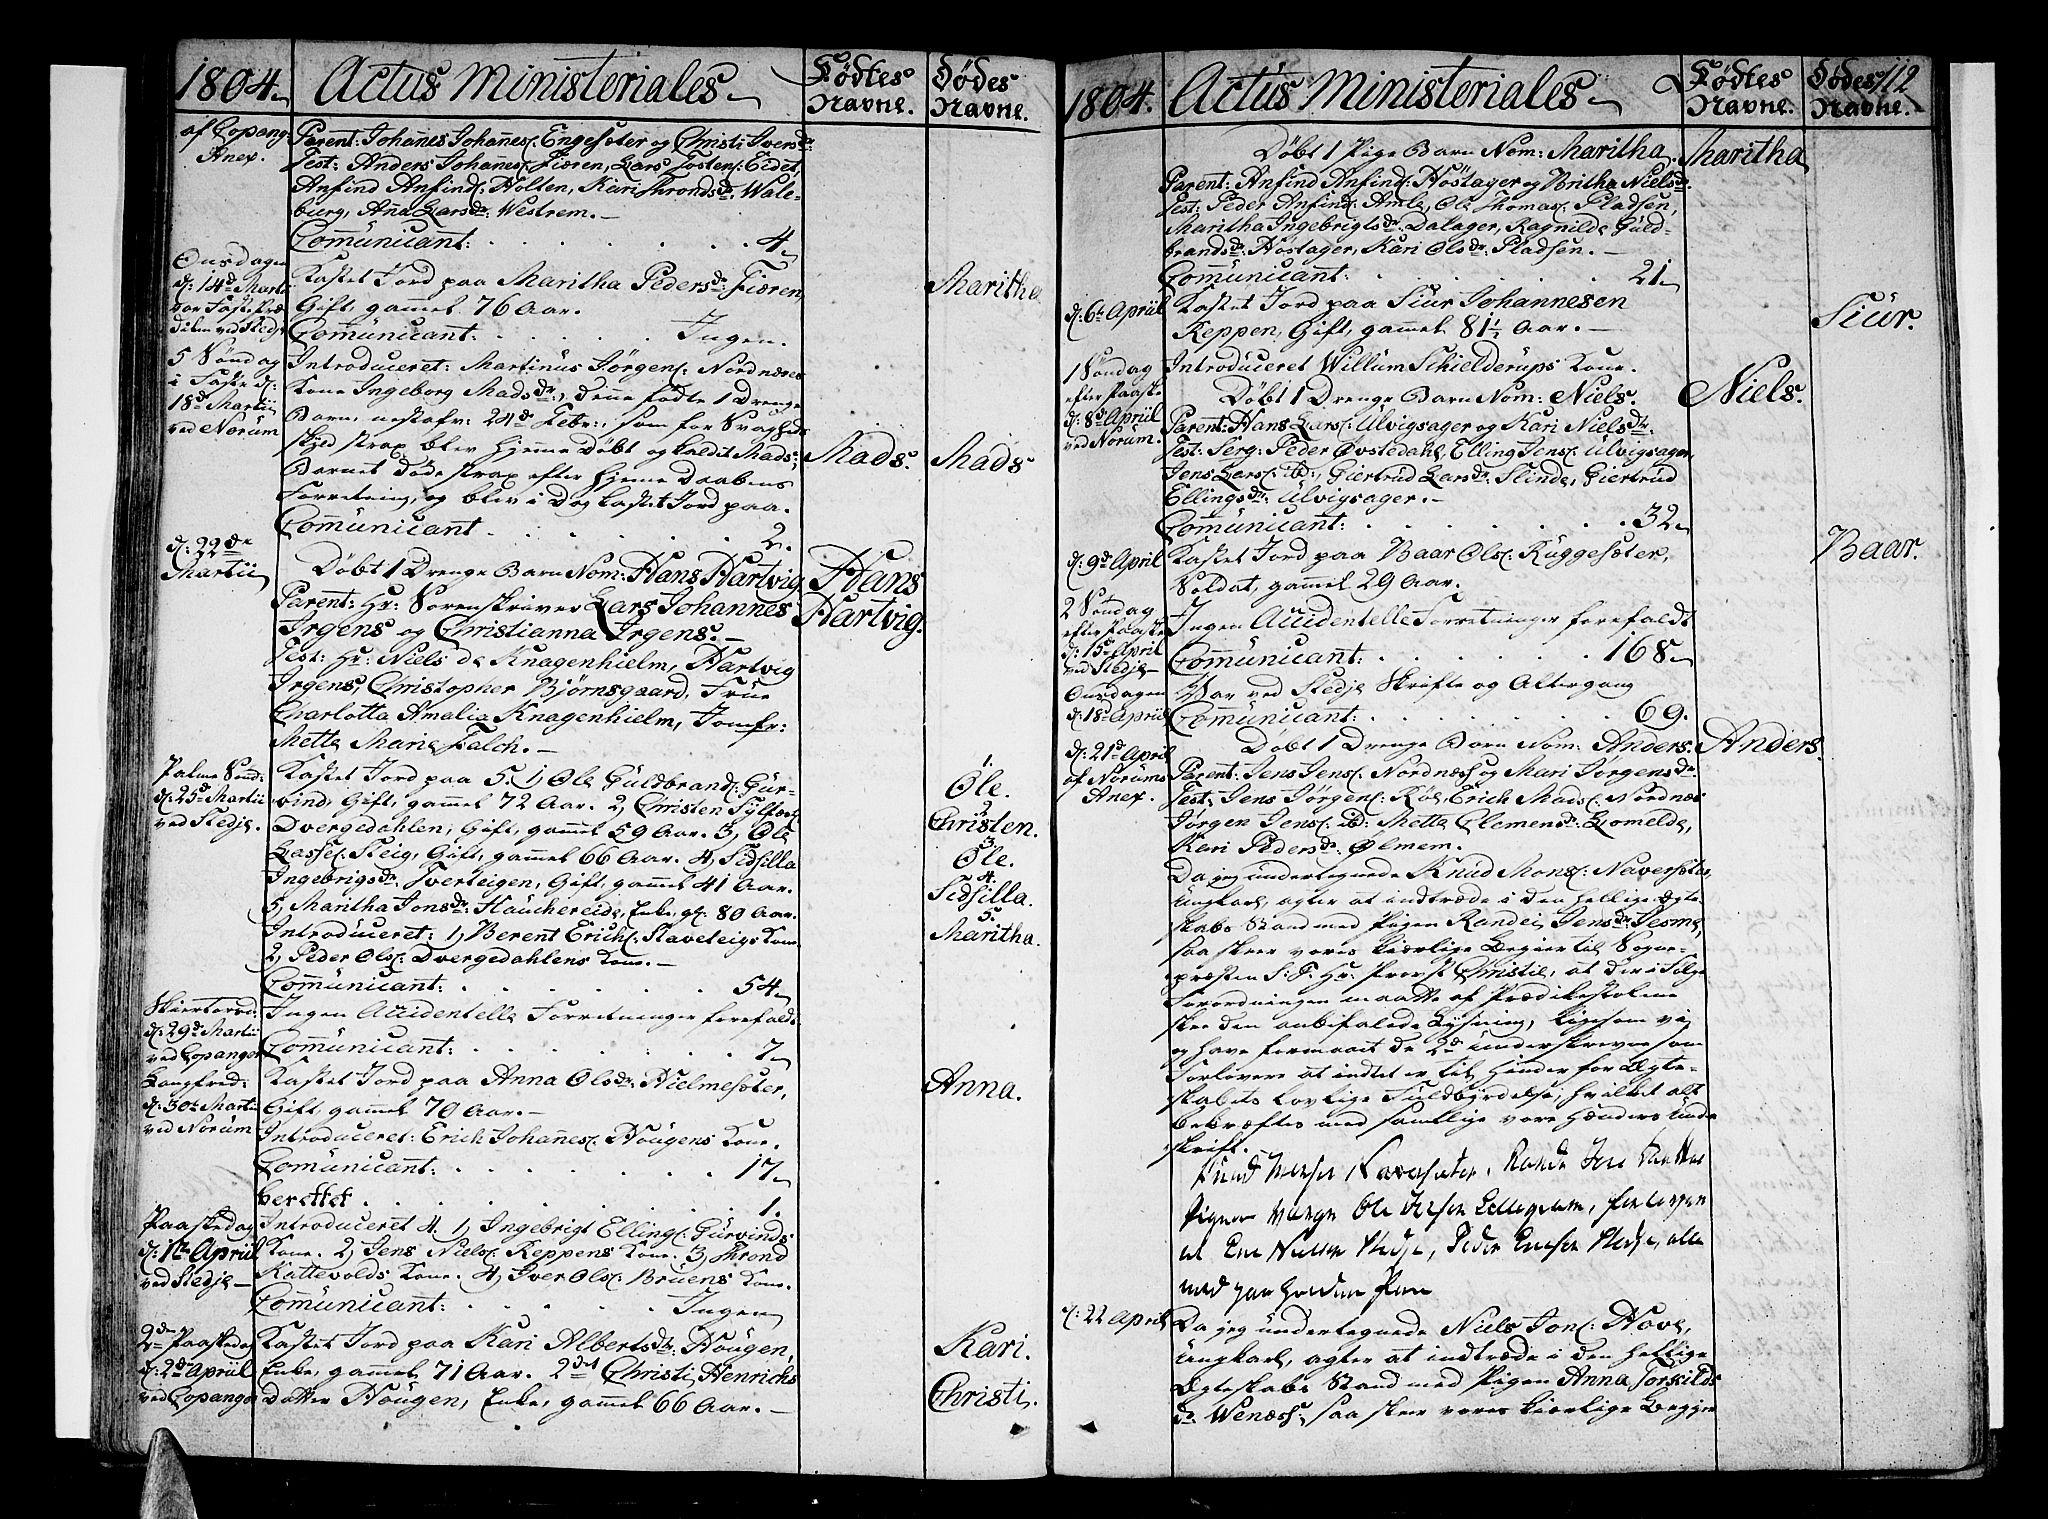 SAB, Sogndal sokneprestembete, H/Haa/Haaa/L0008: Parish register (official) no. A 8, 1795-1809, p. 112